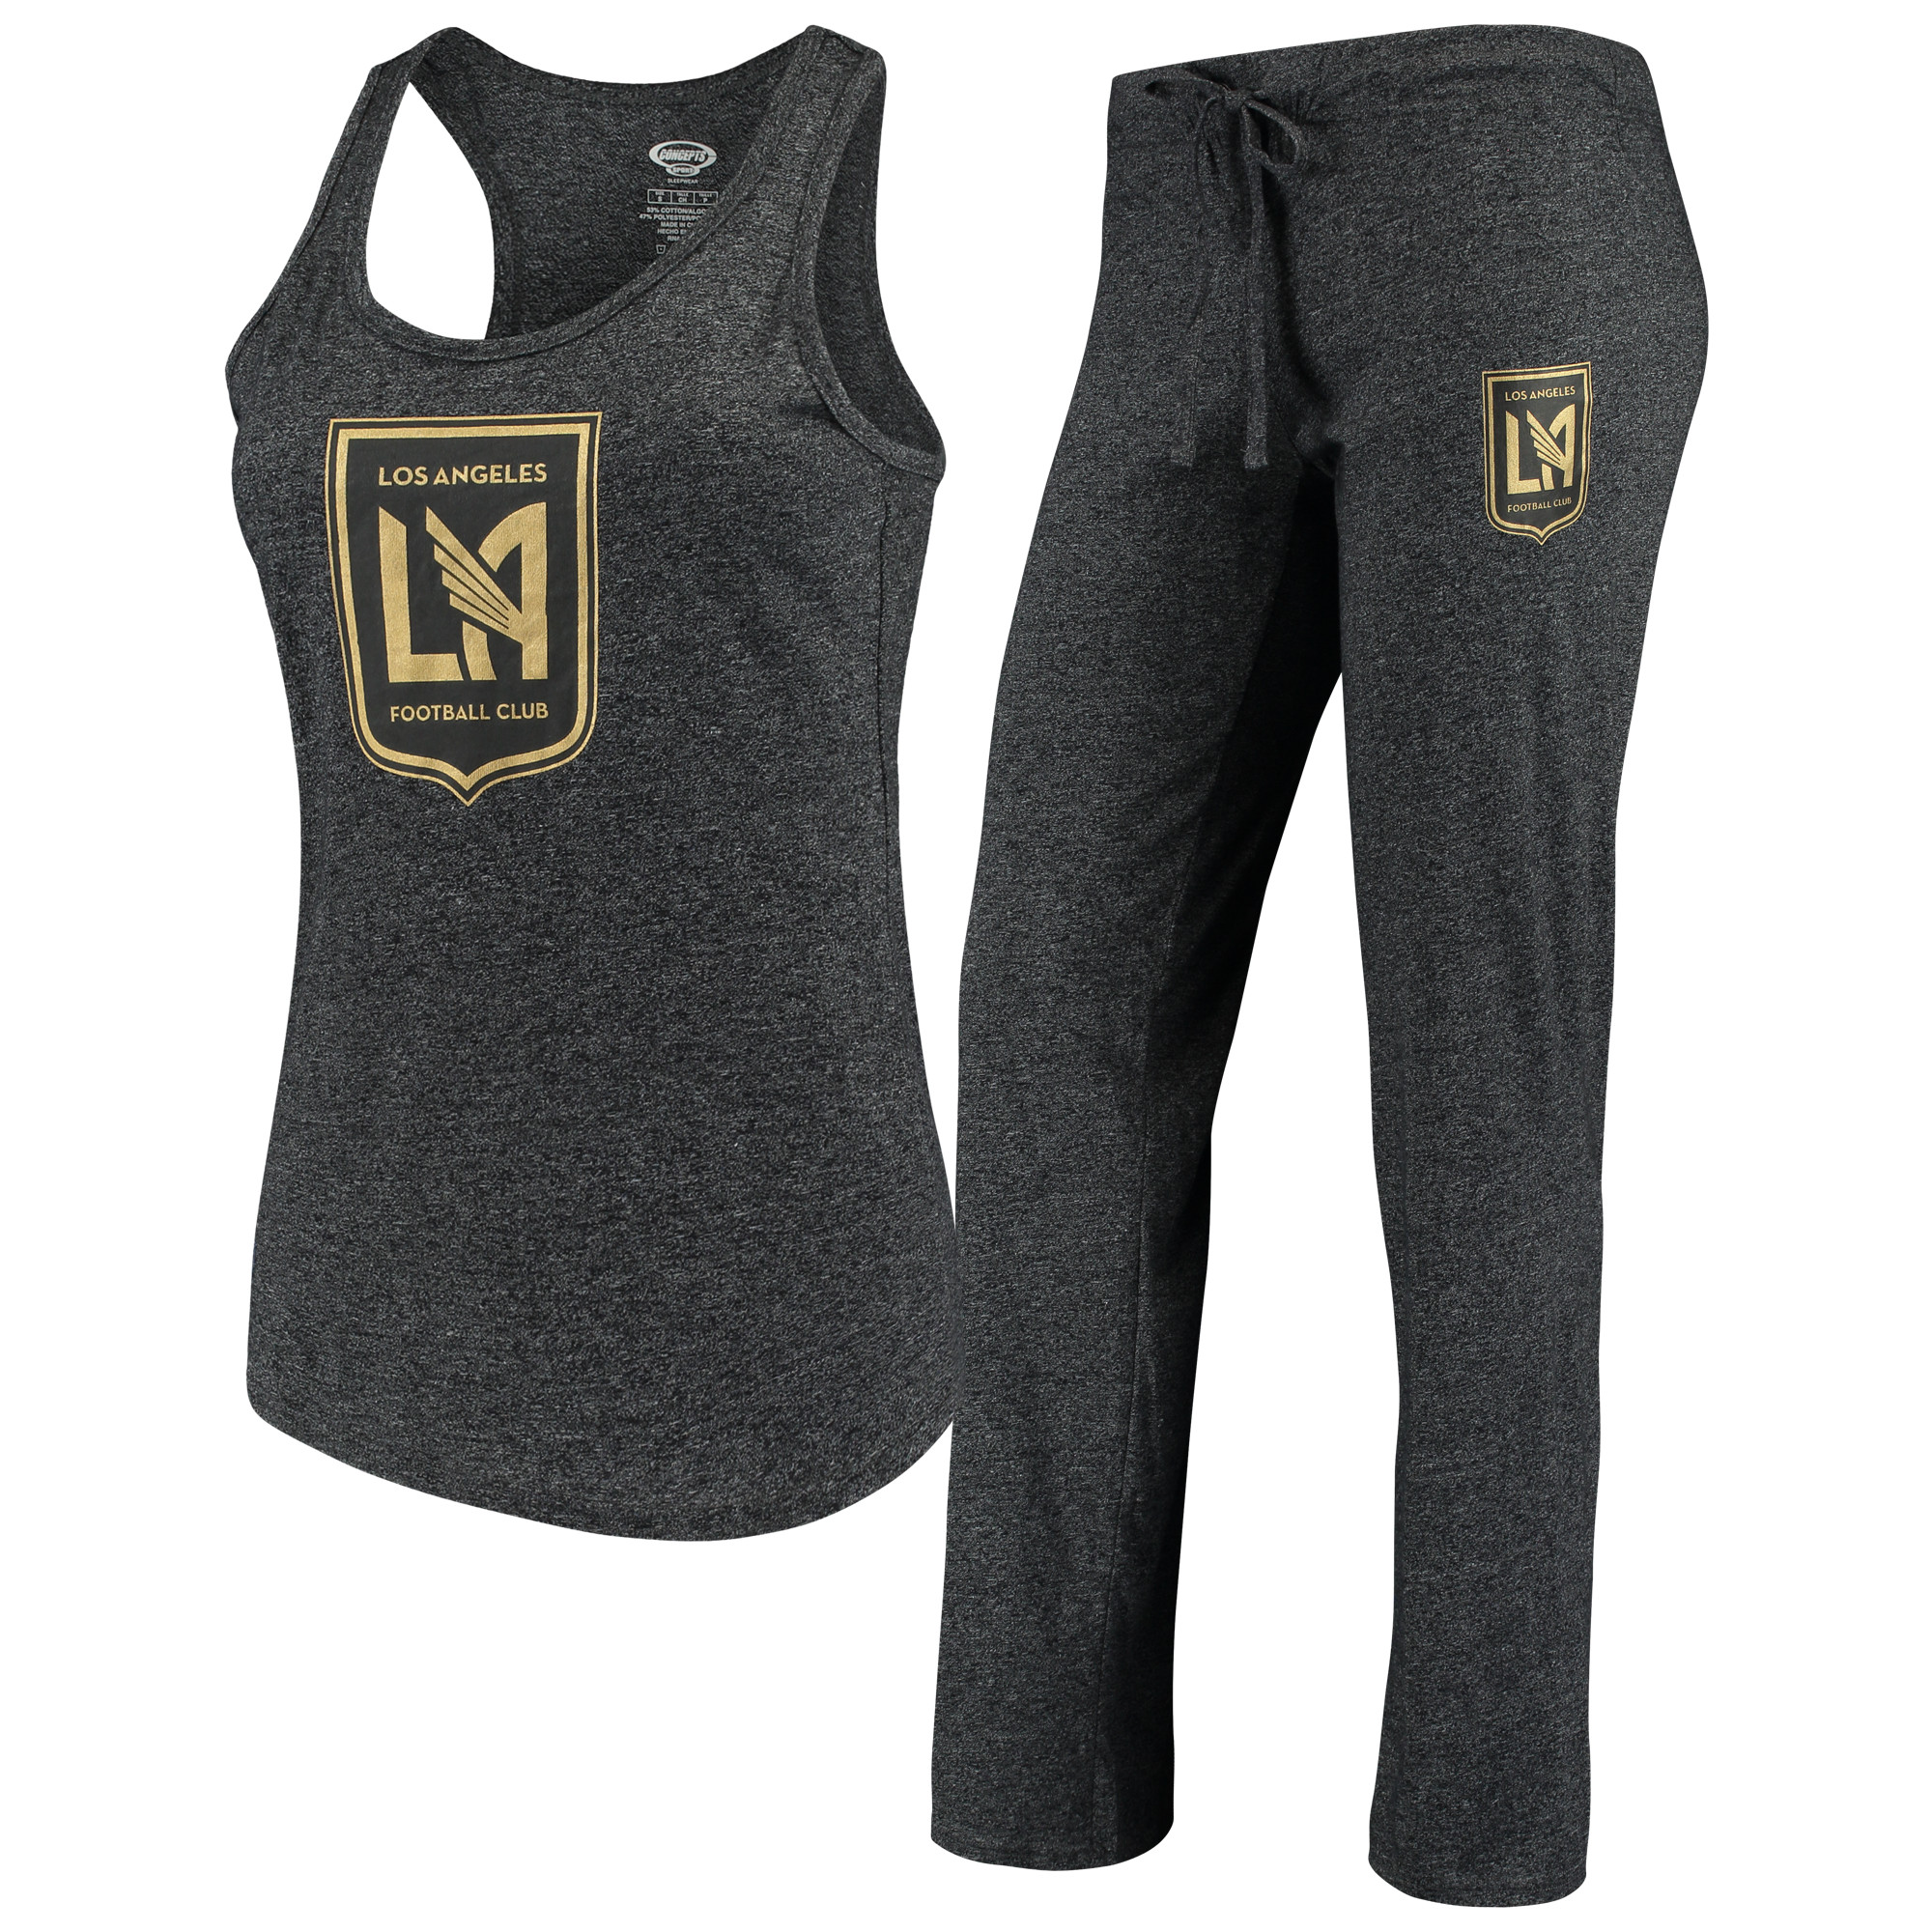 LAFC Concepts Sport Women's Spar Tank Top & Pants Sleep Set - Heathered Charcoal